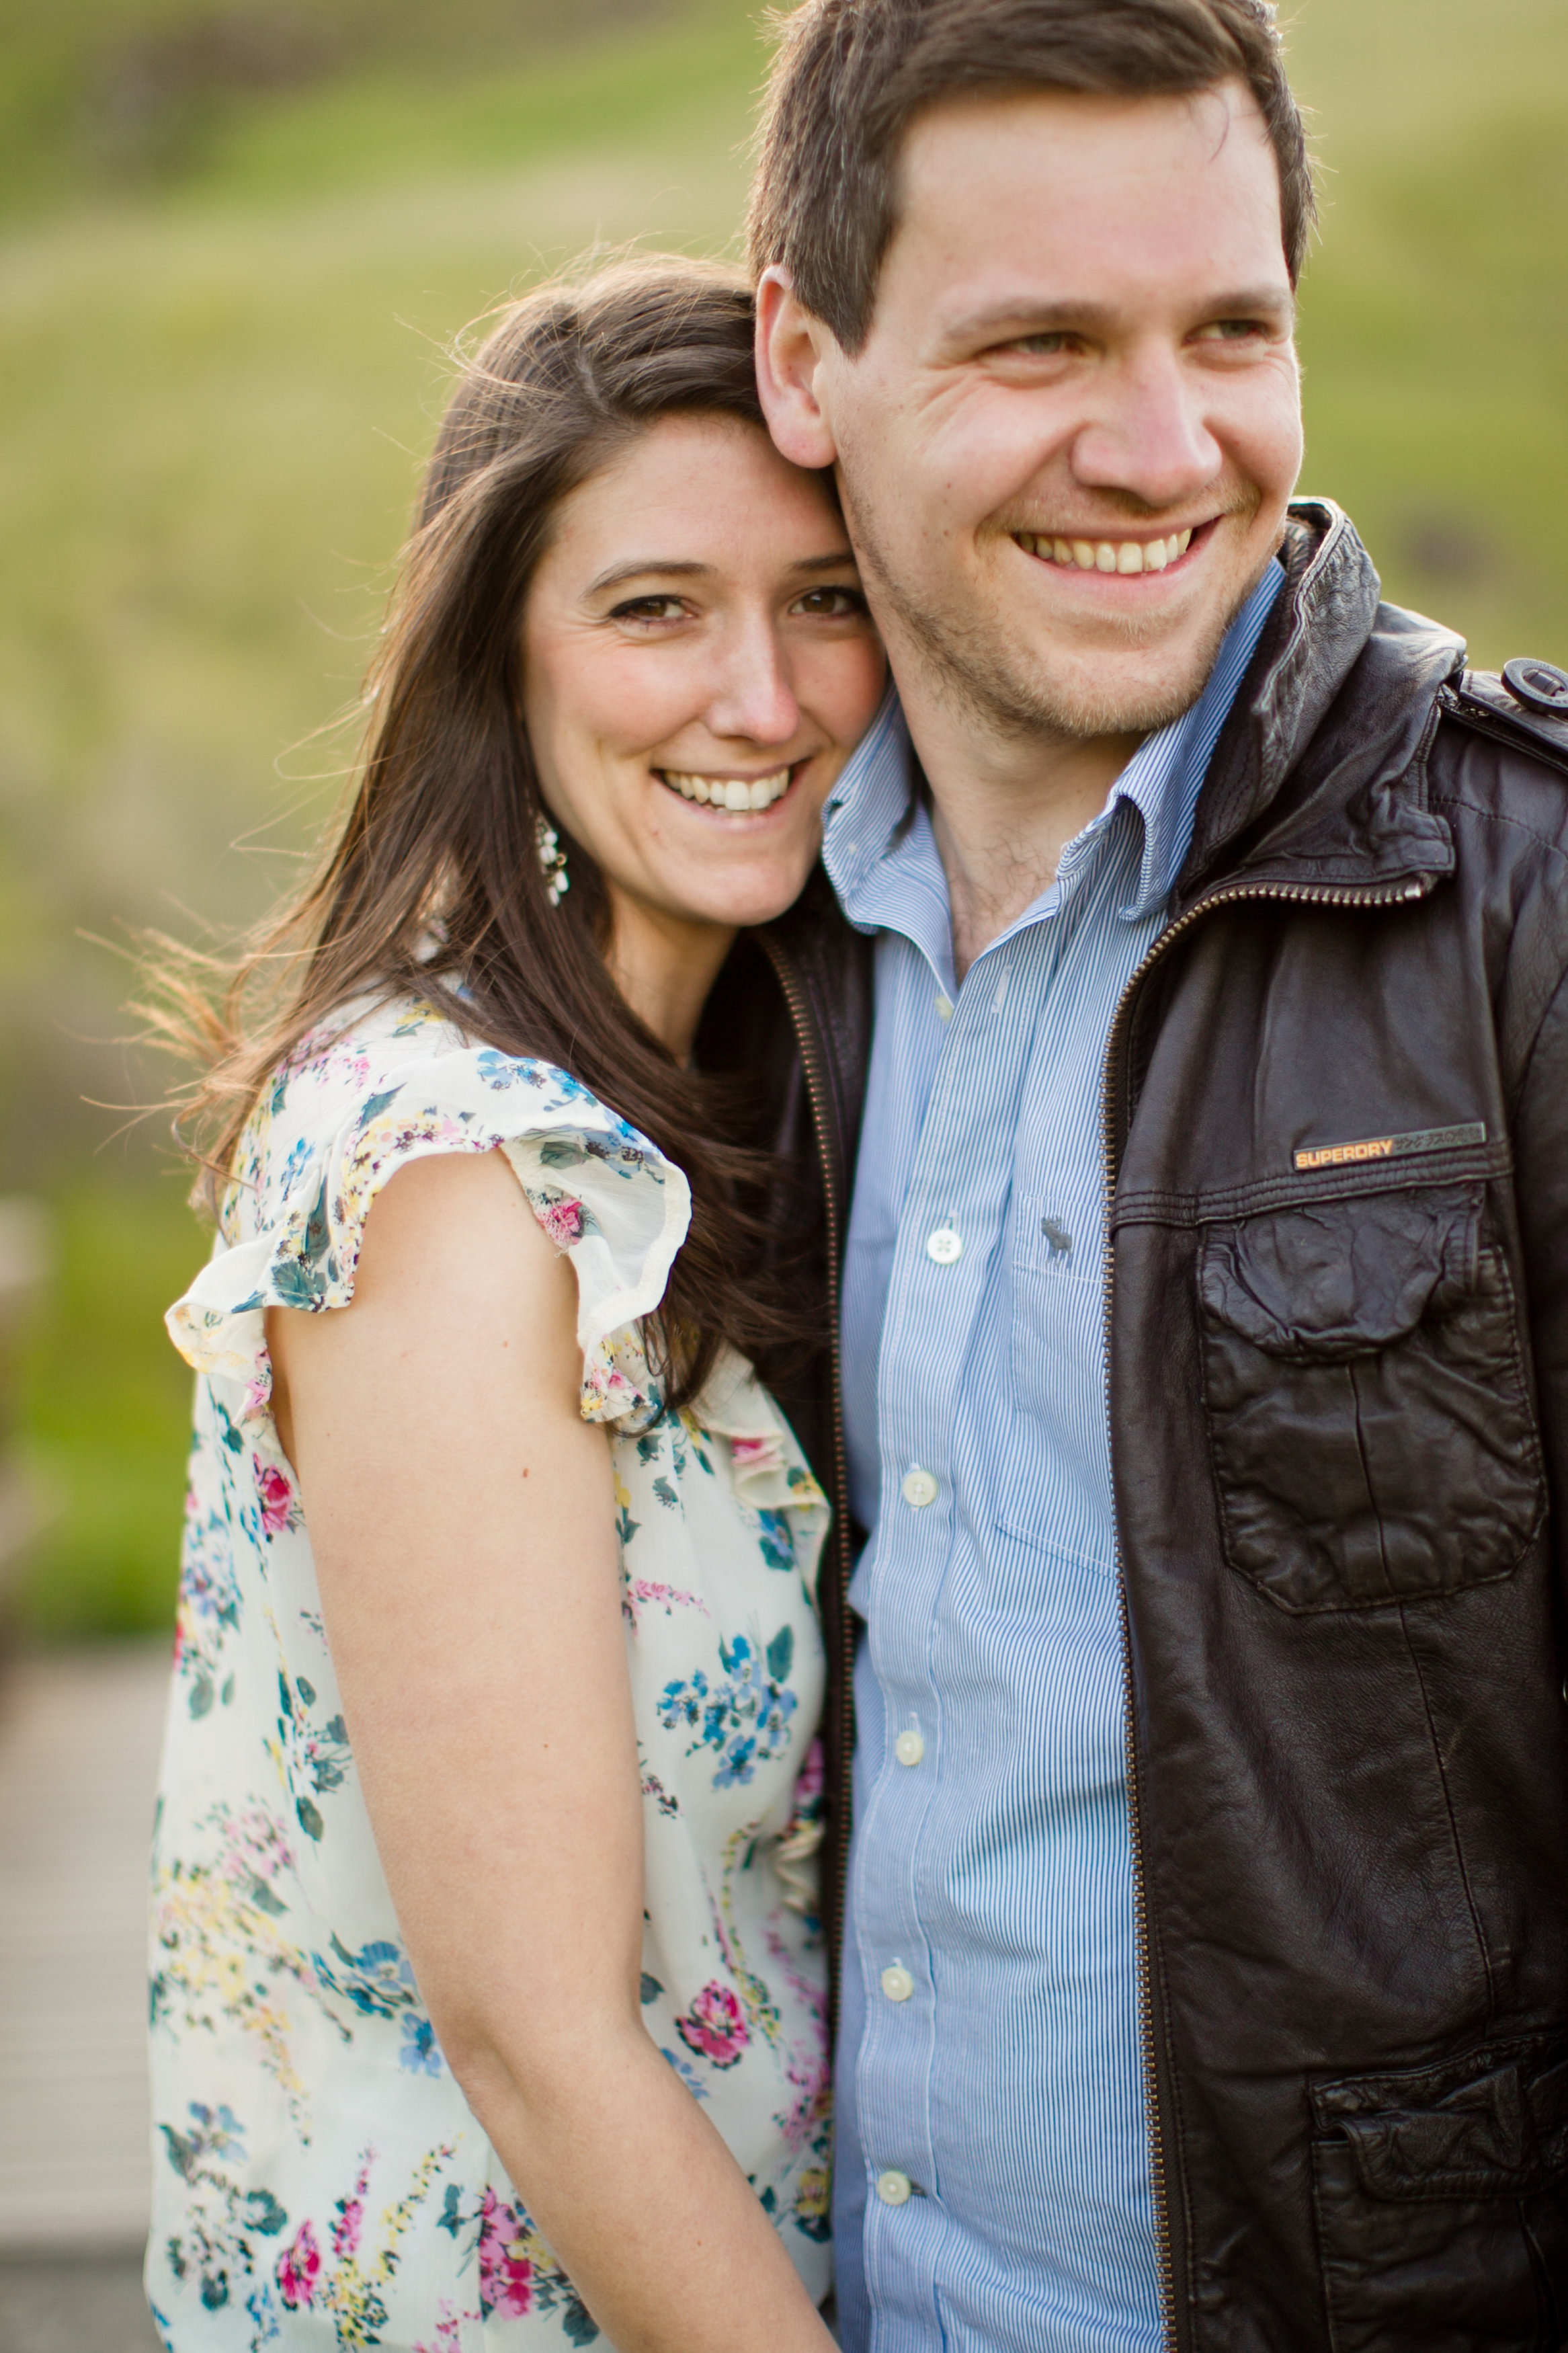 family portrait photographer dorset Tom & Lizzie Redman